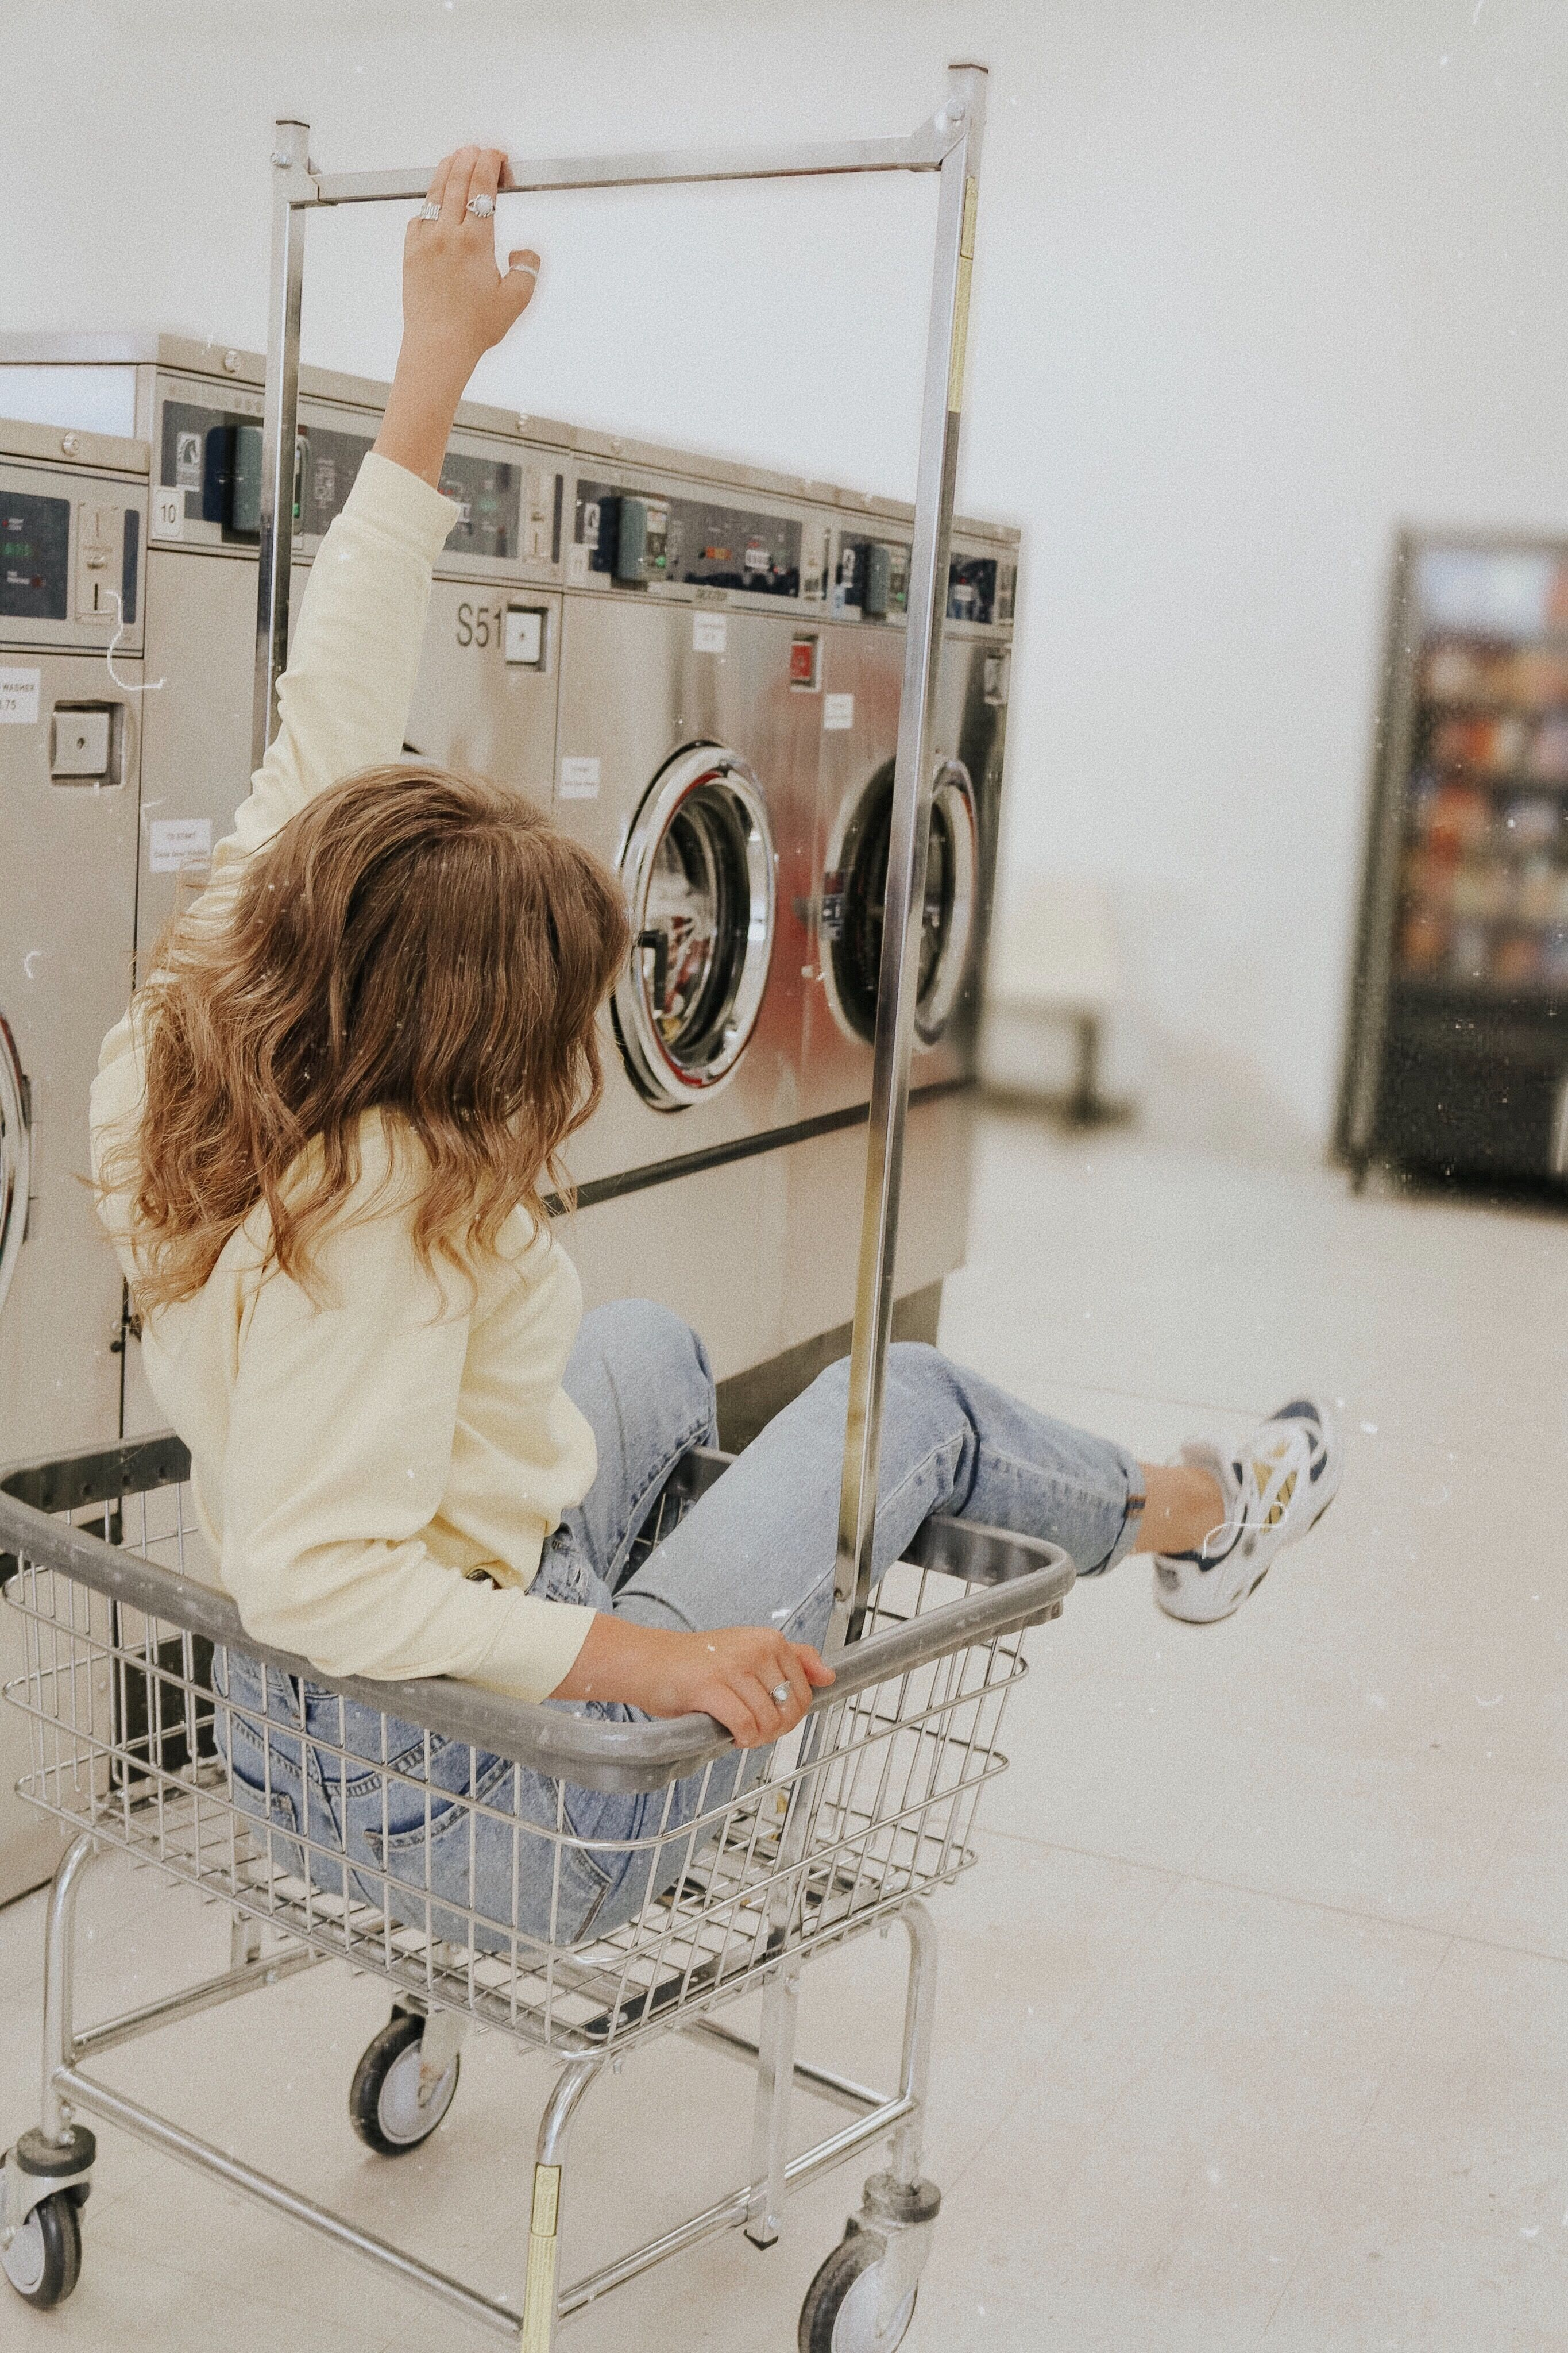 The Laundromat Grunge Photography Photography Inspo Retro Photography